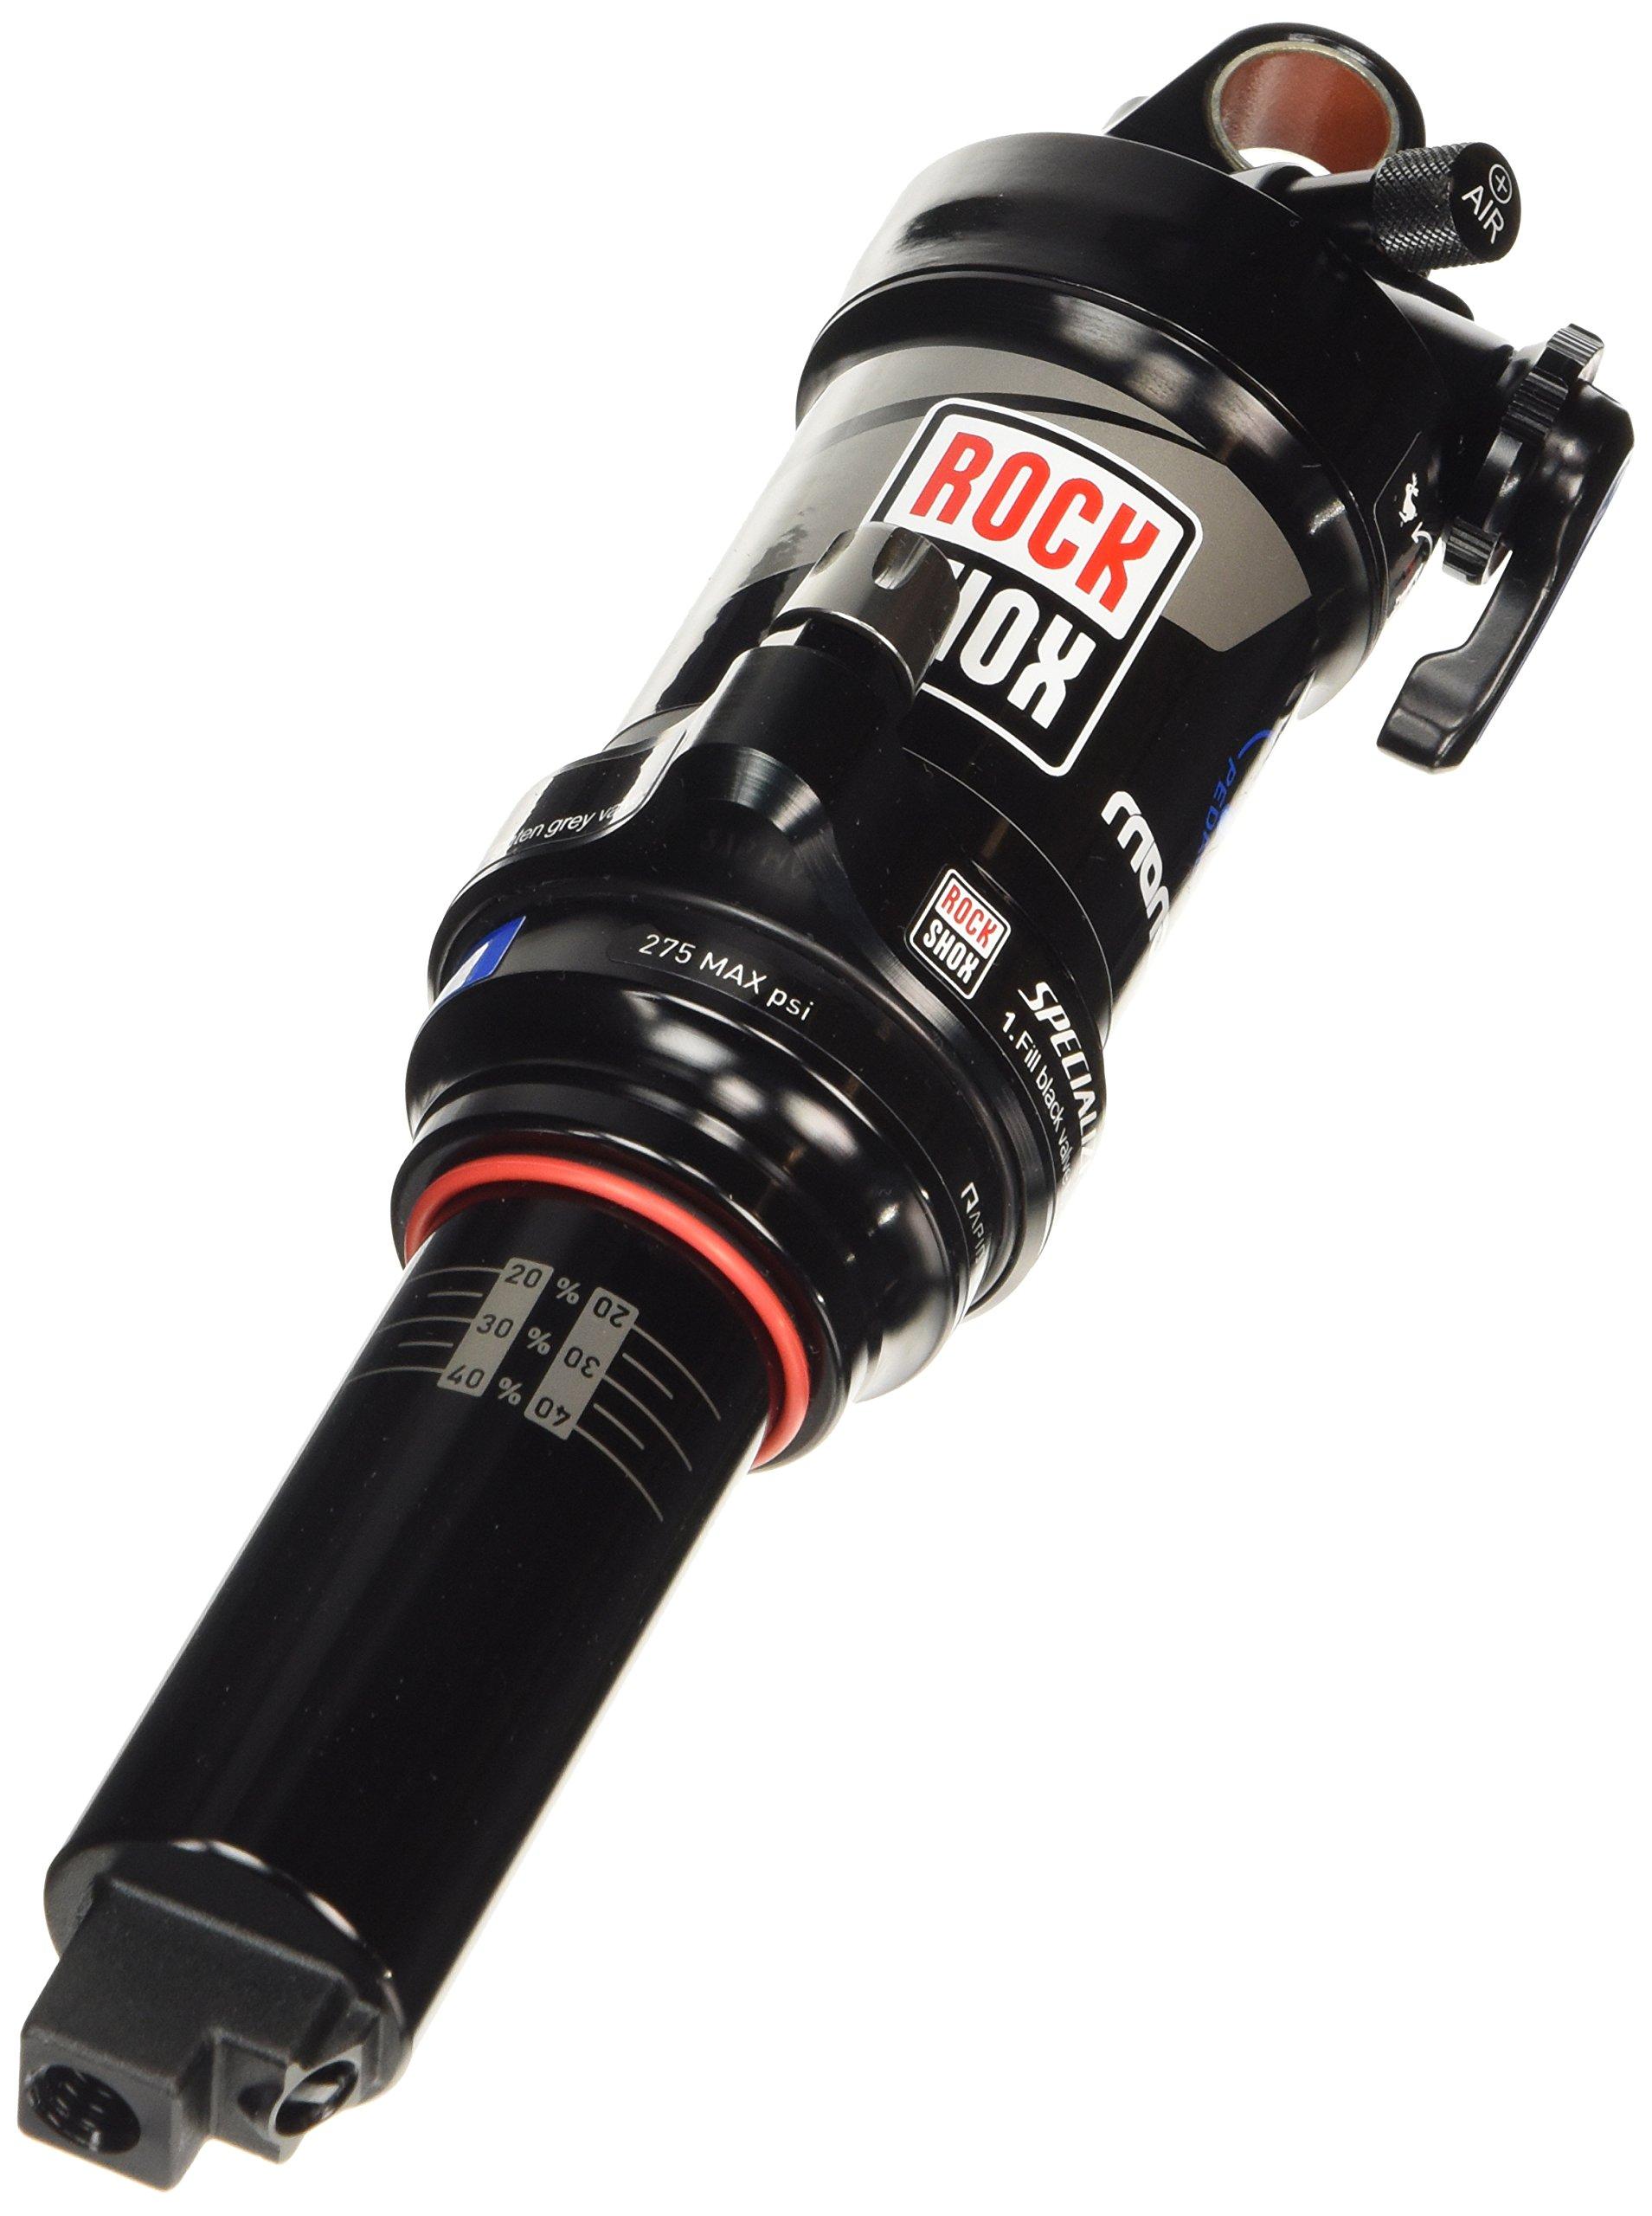 RockShox Monarch RT3 Autosag Rear Shock, 7.75'' x 1.90'' (197mm x 48mm) Fast Black Body, 2016 Specialized Stumpjumper